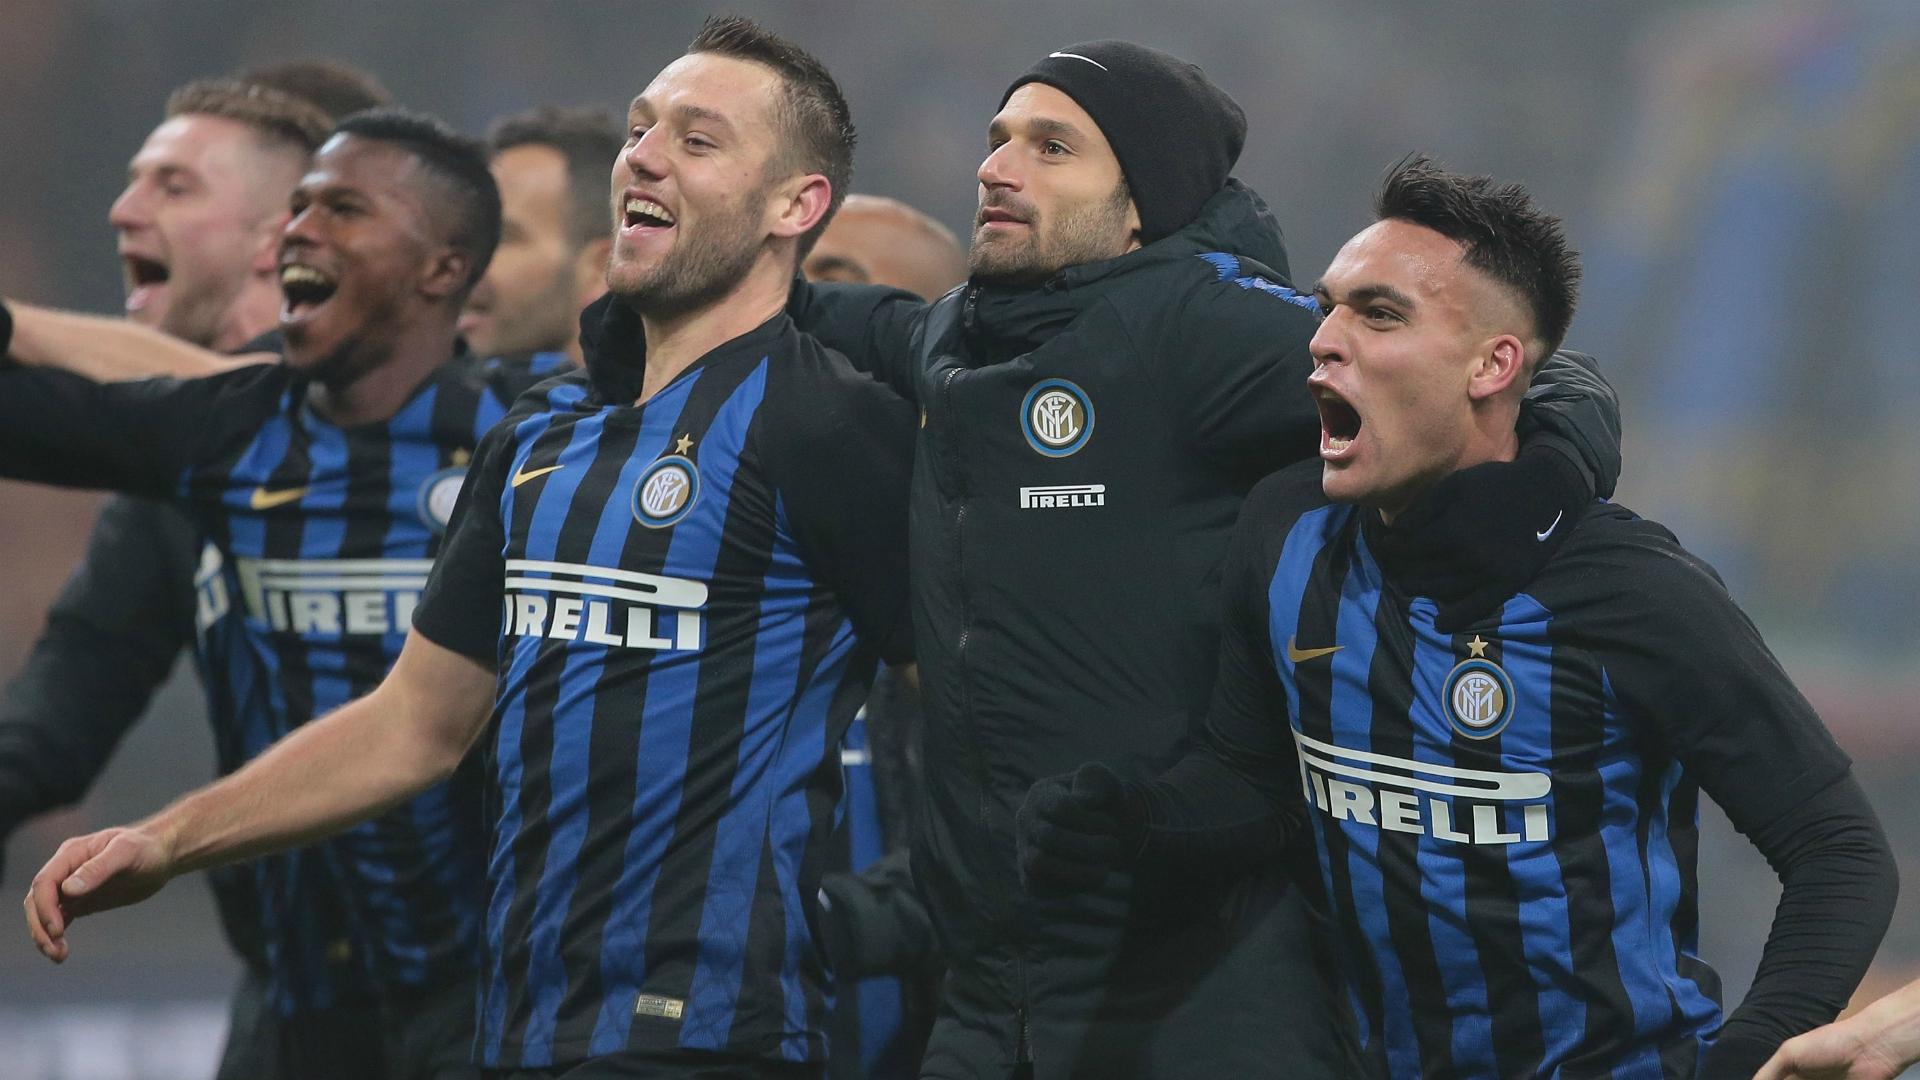 Inter celebrating Serie A 12262018